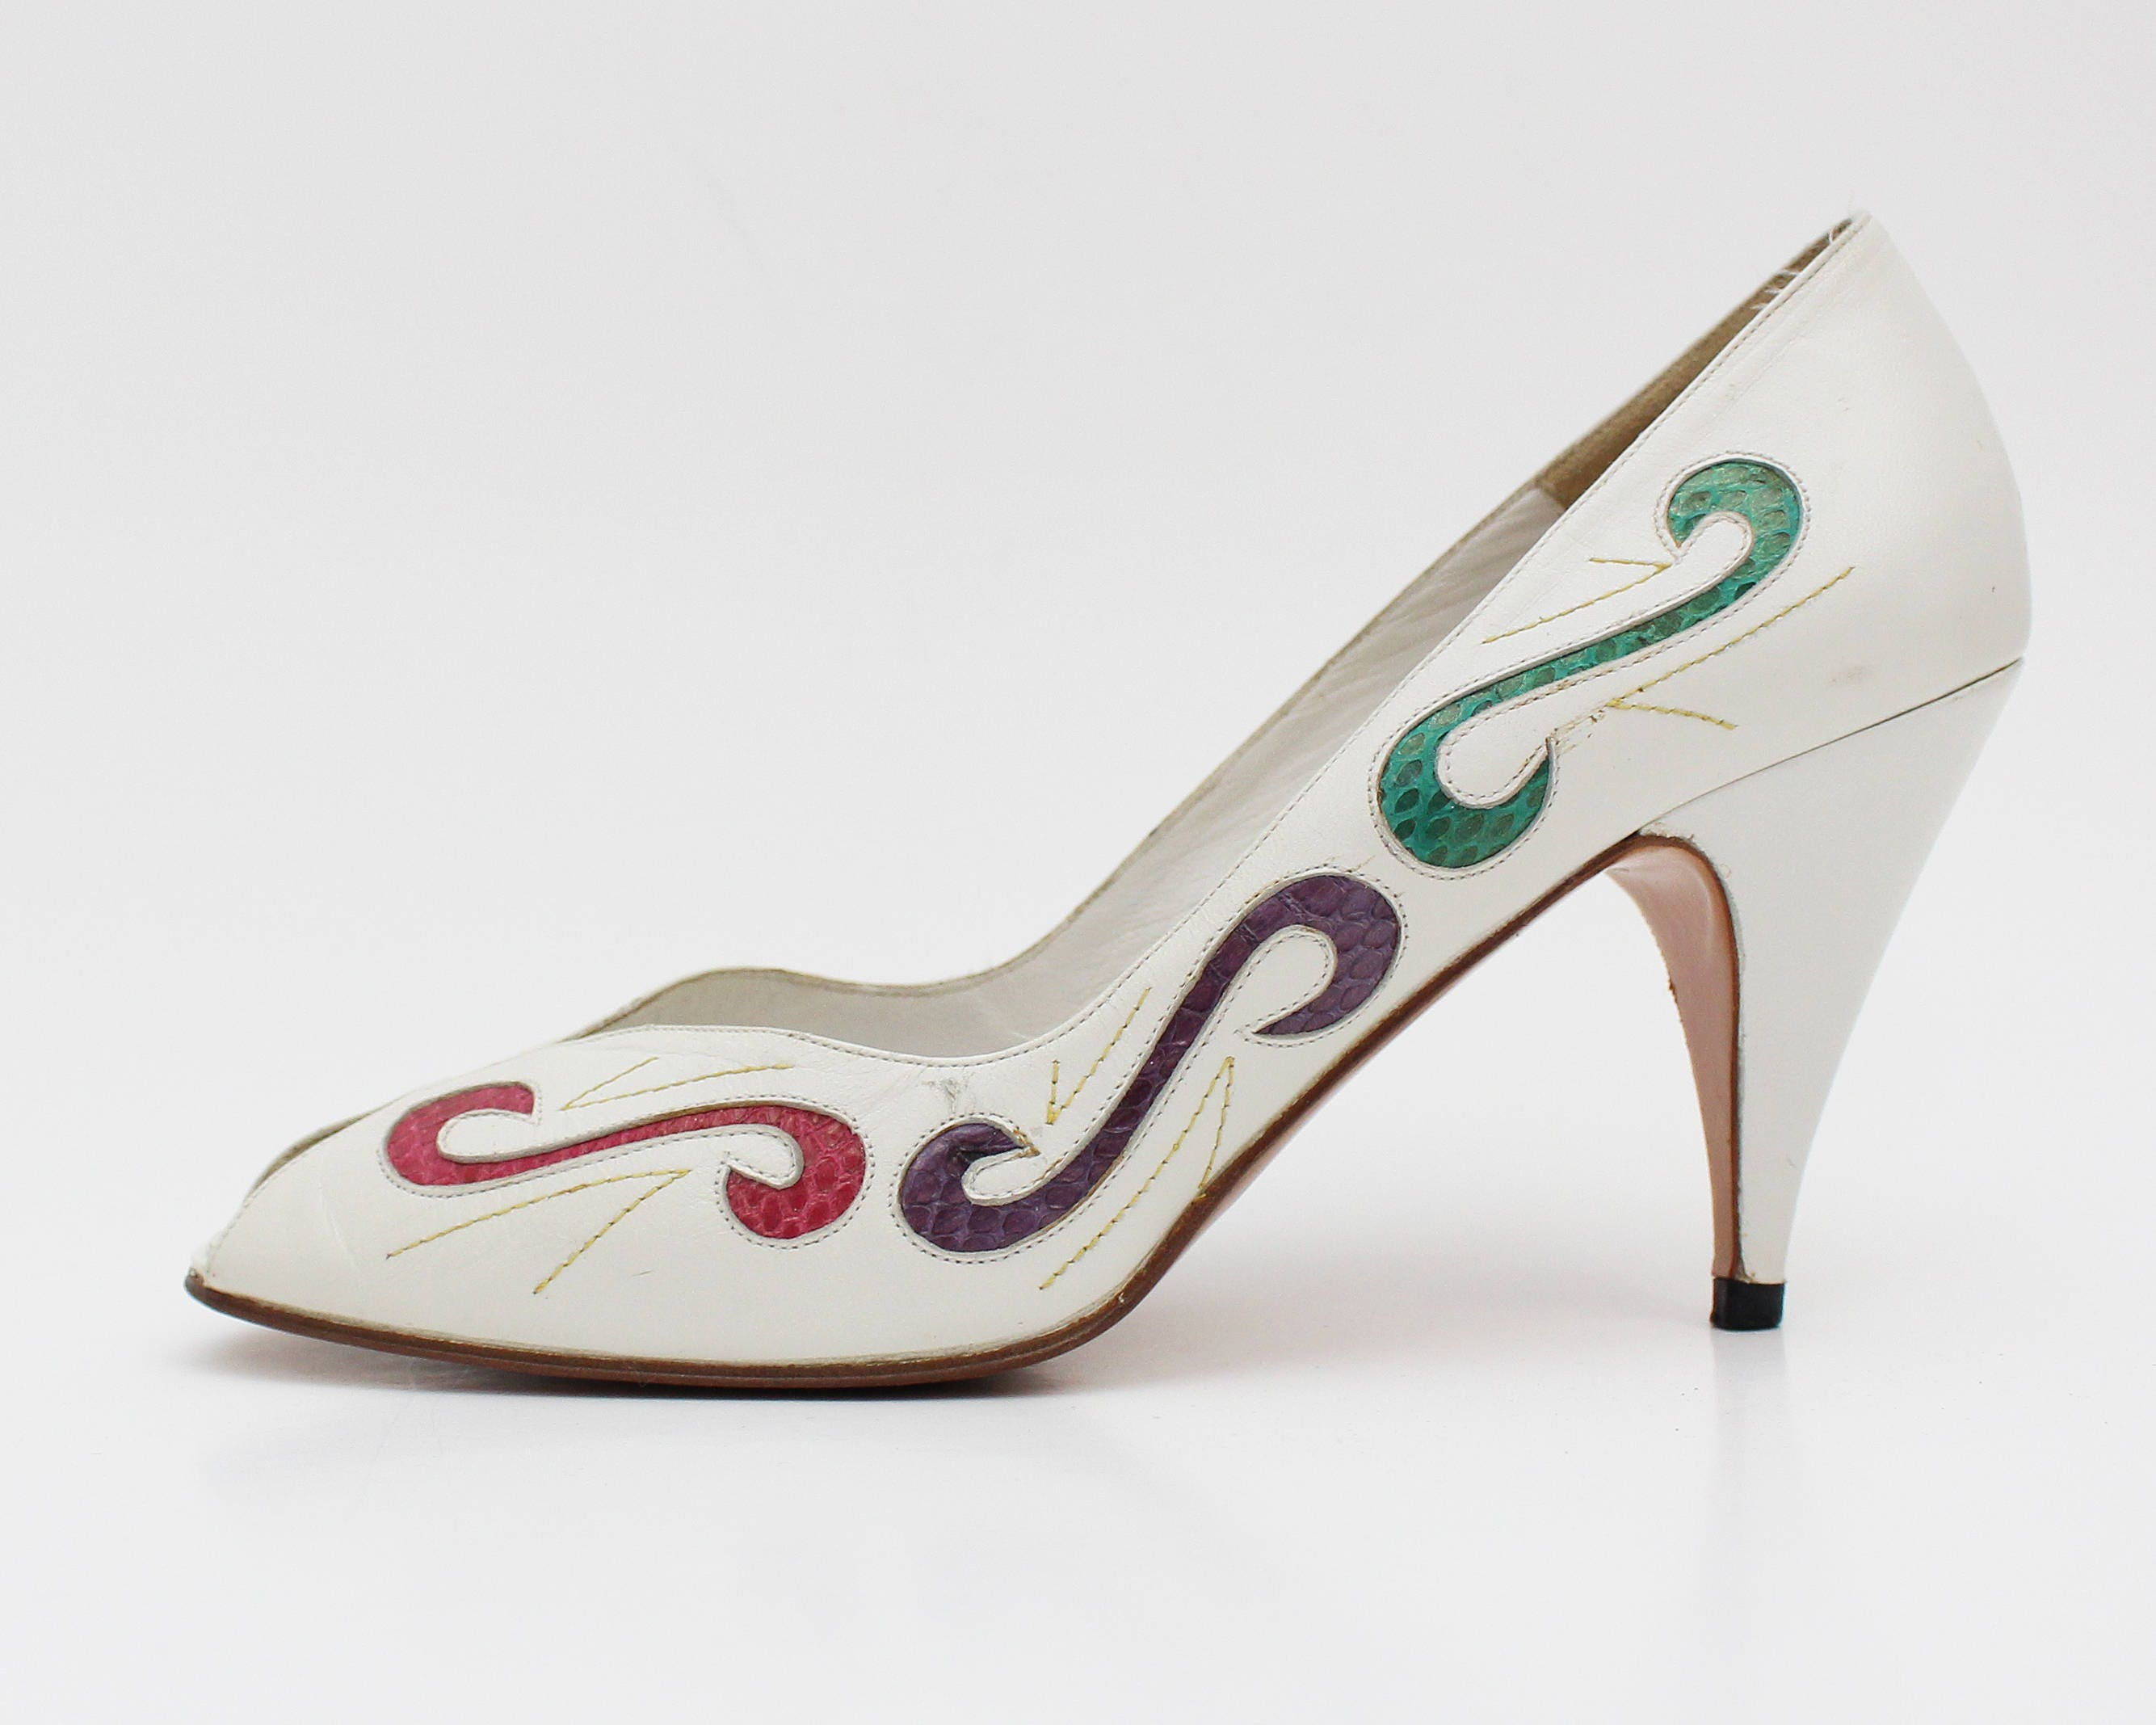 46e418e254839 White Leather Peep Toe Shoes - Size 7 and Half - Vintage Swirl ...